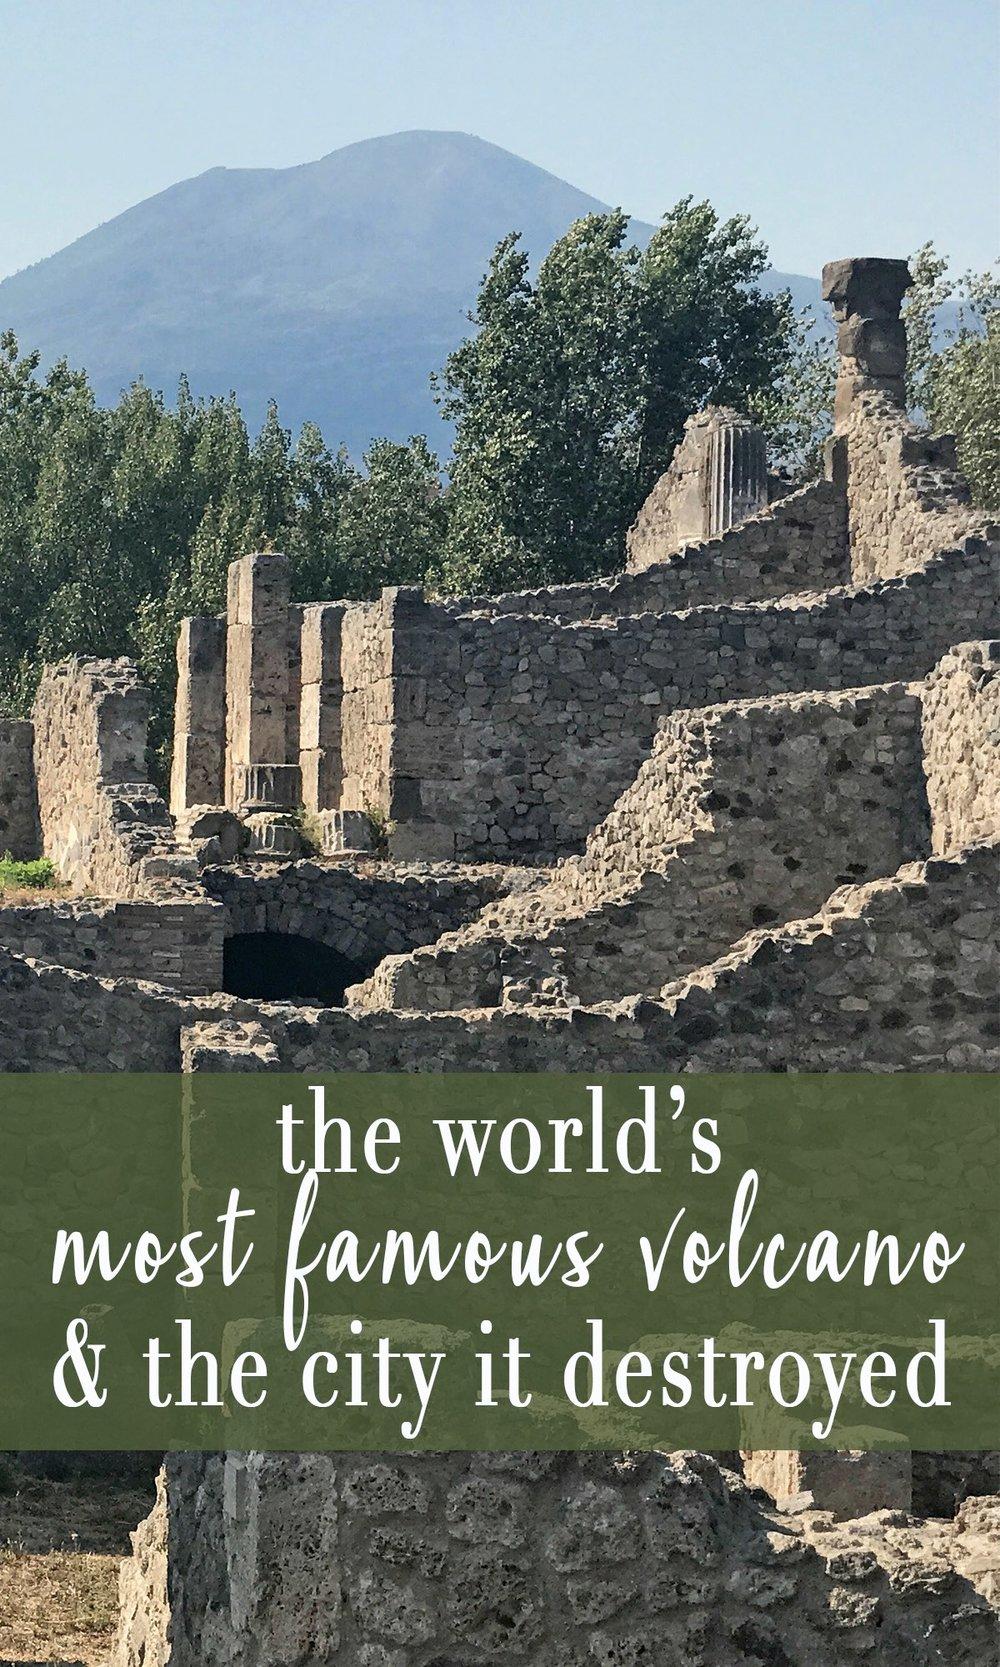 Mount-Vesuvius-Pompeii-Italy.jpg